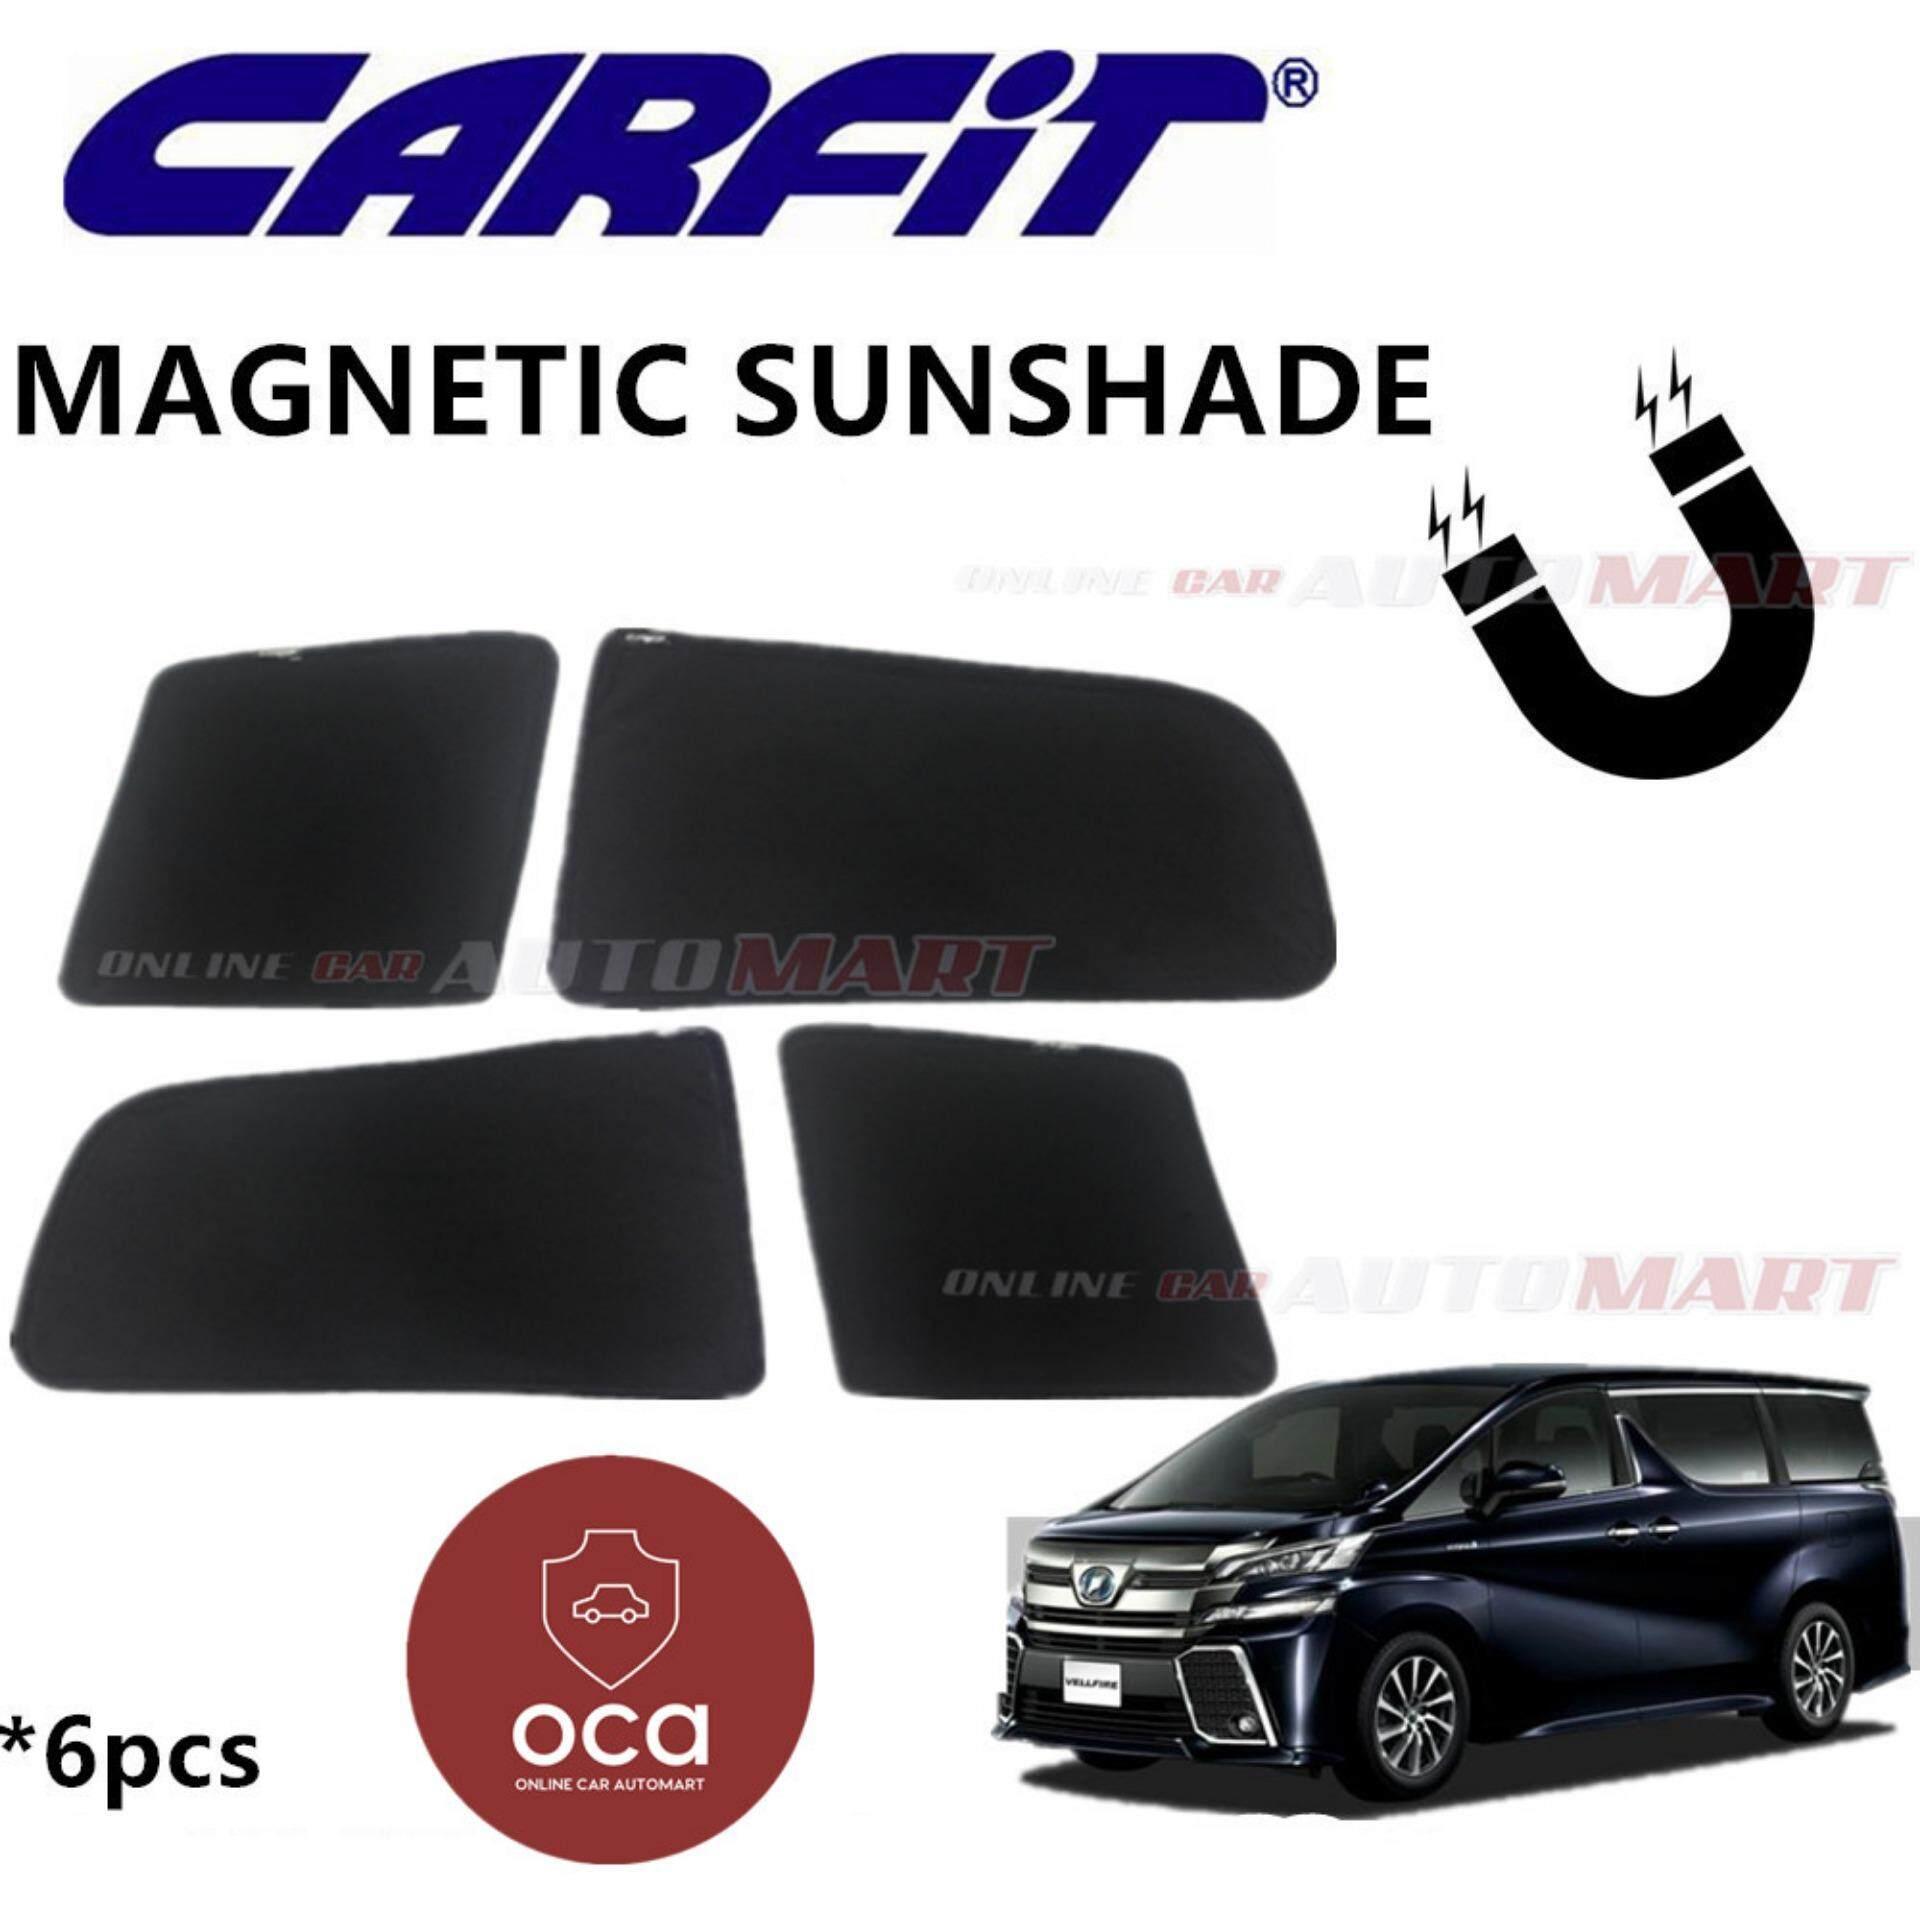 CARFIT OEM Magnetic Custom Fit Sunshade For Toyota Alphard/Vellfire Yr 2015-2018 (6pcs Sets)